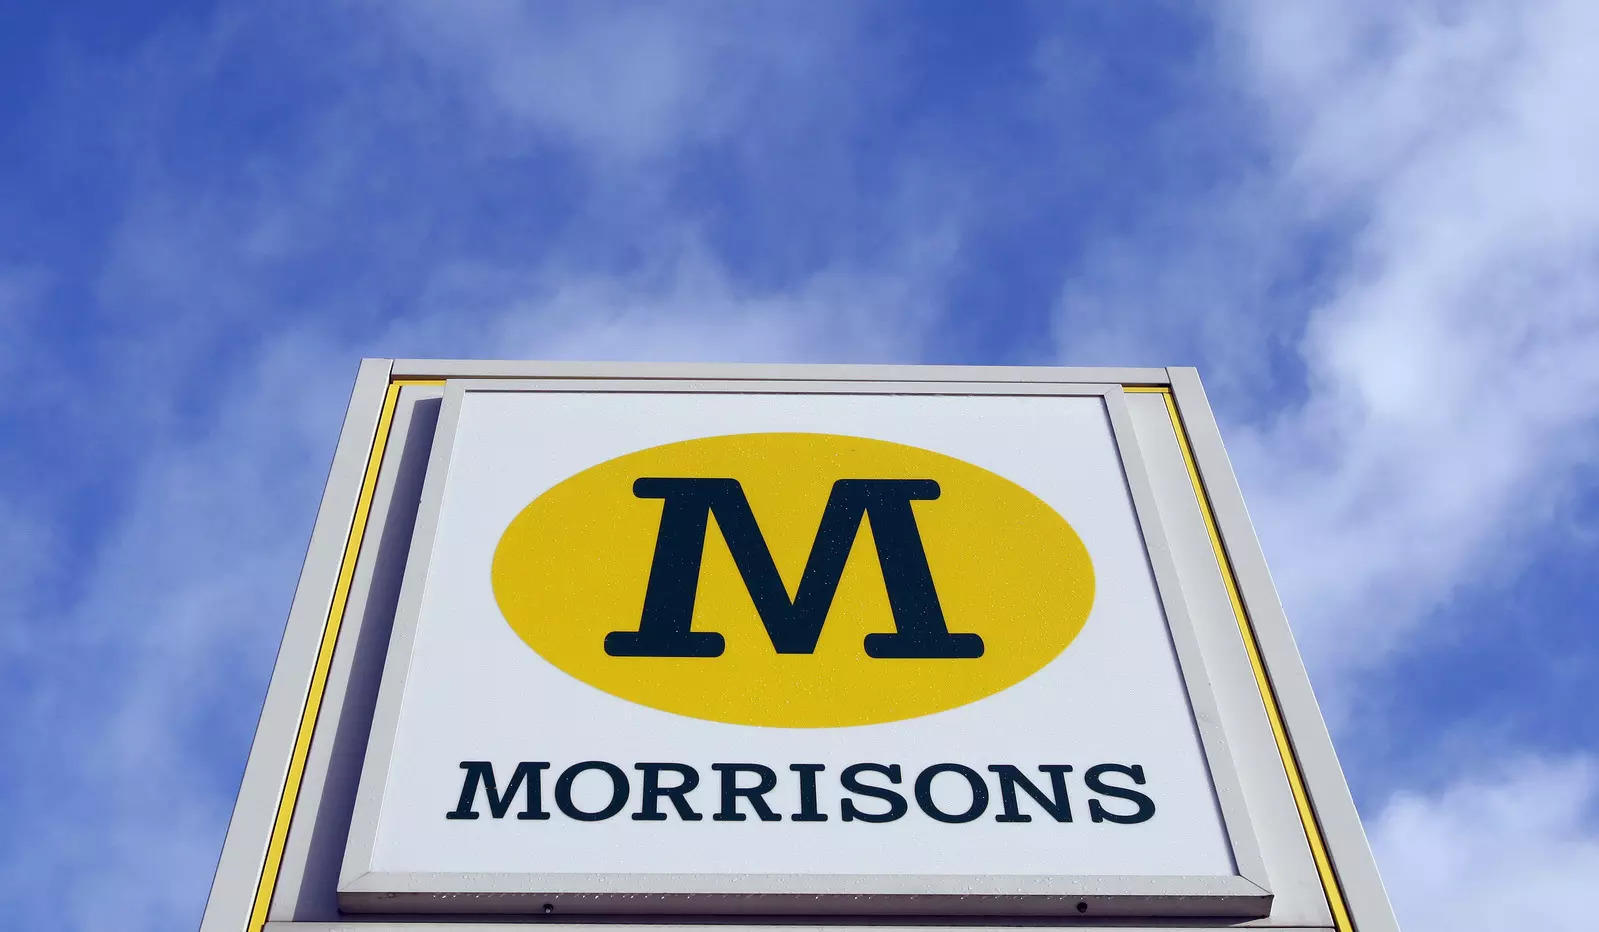 M&G says $8.7 bln Morrisons bid doesn't reflect company's true value